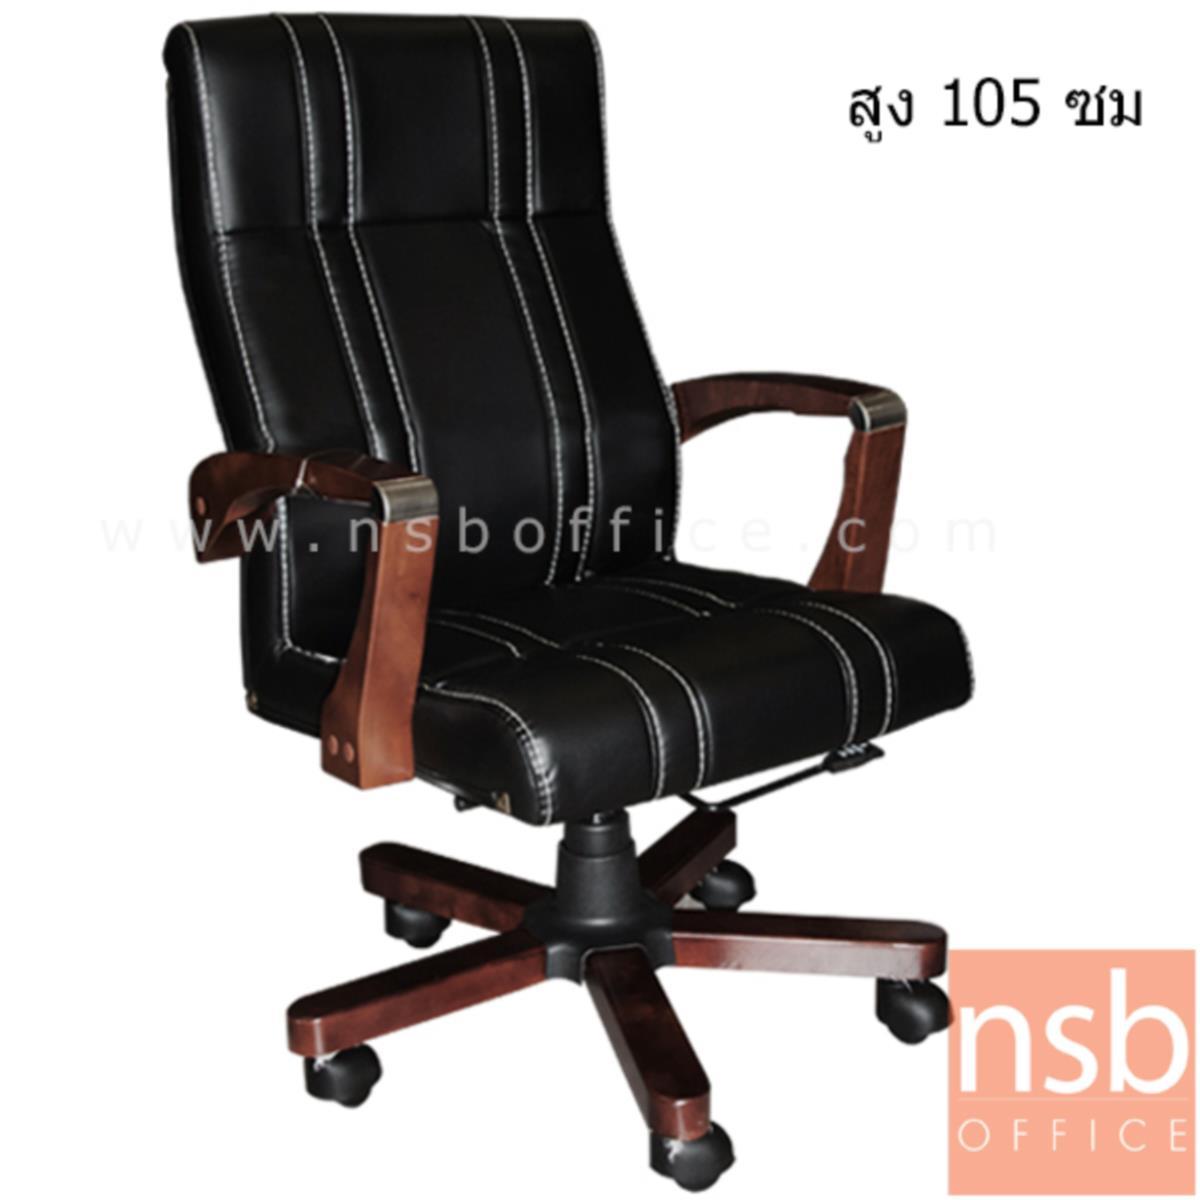 B25A059:เก้าอี้ผู้บริหารหนัง PU รุ่น Zimmerman (ซิมเมอร์แมน)  ขาไม้